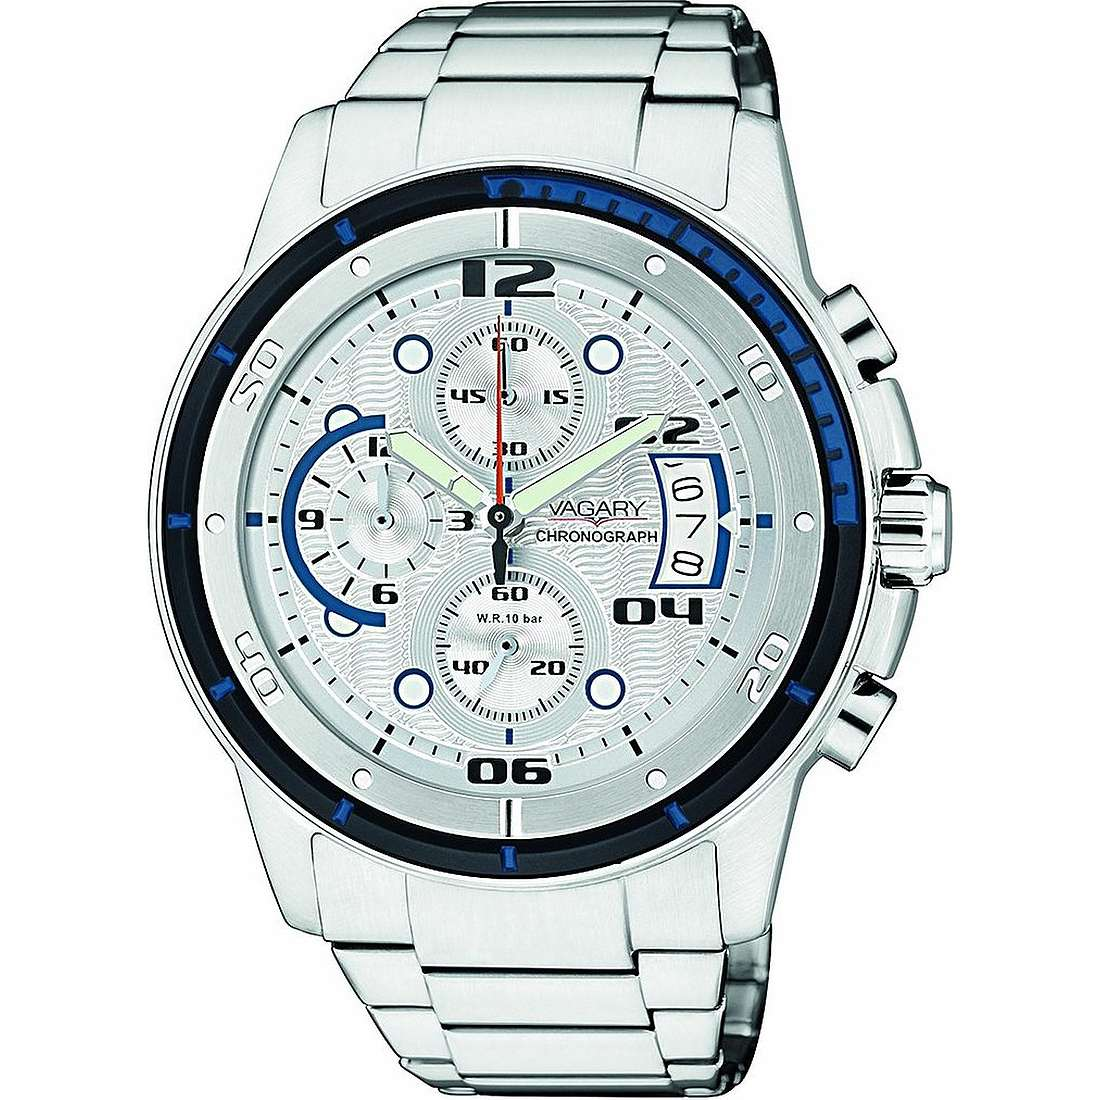 orologio cronografo uomo Vagary By Citizen IA8-211-11